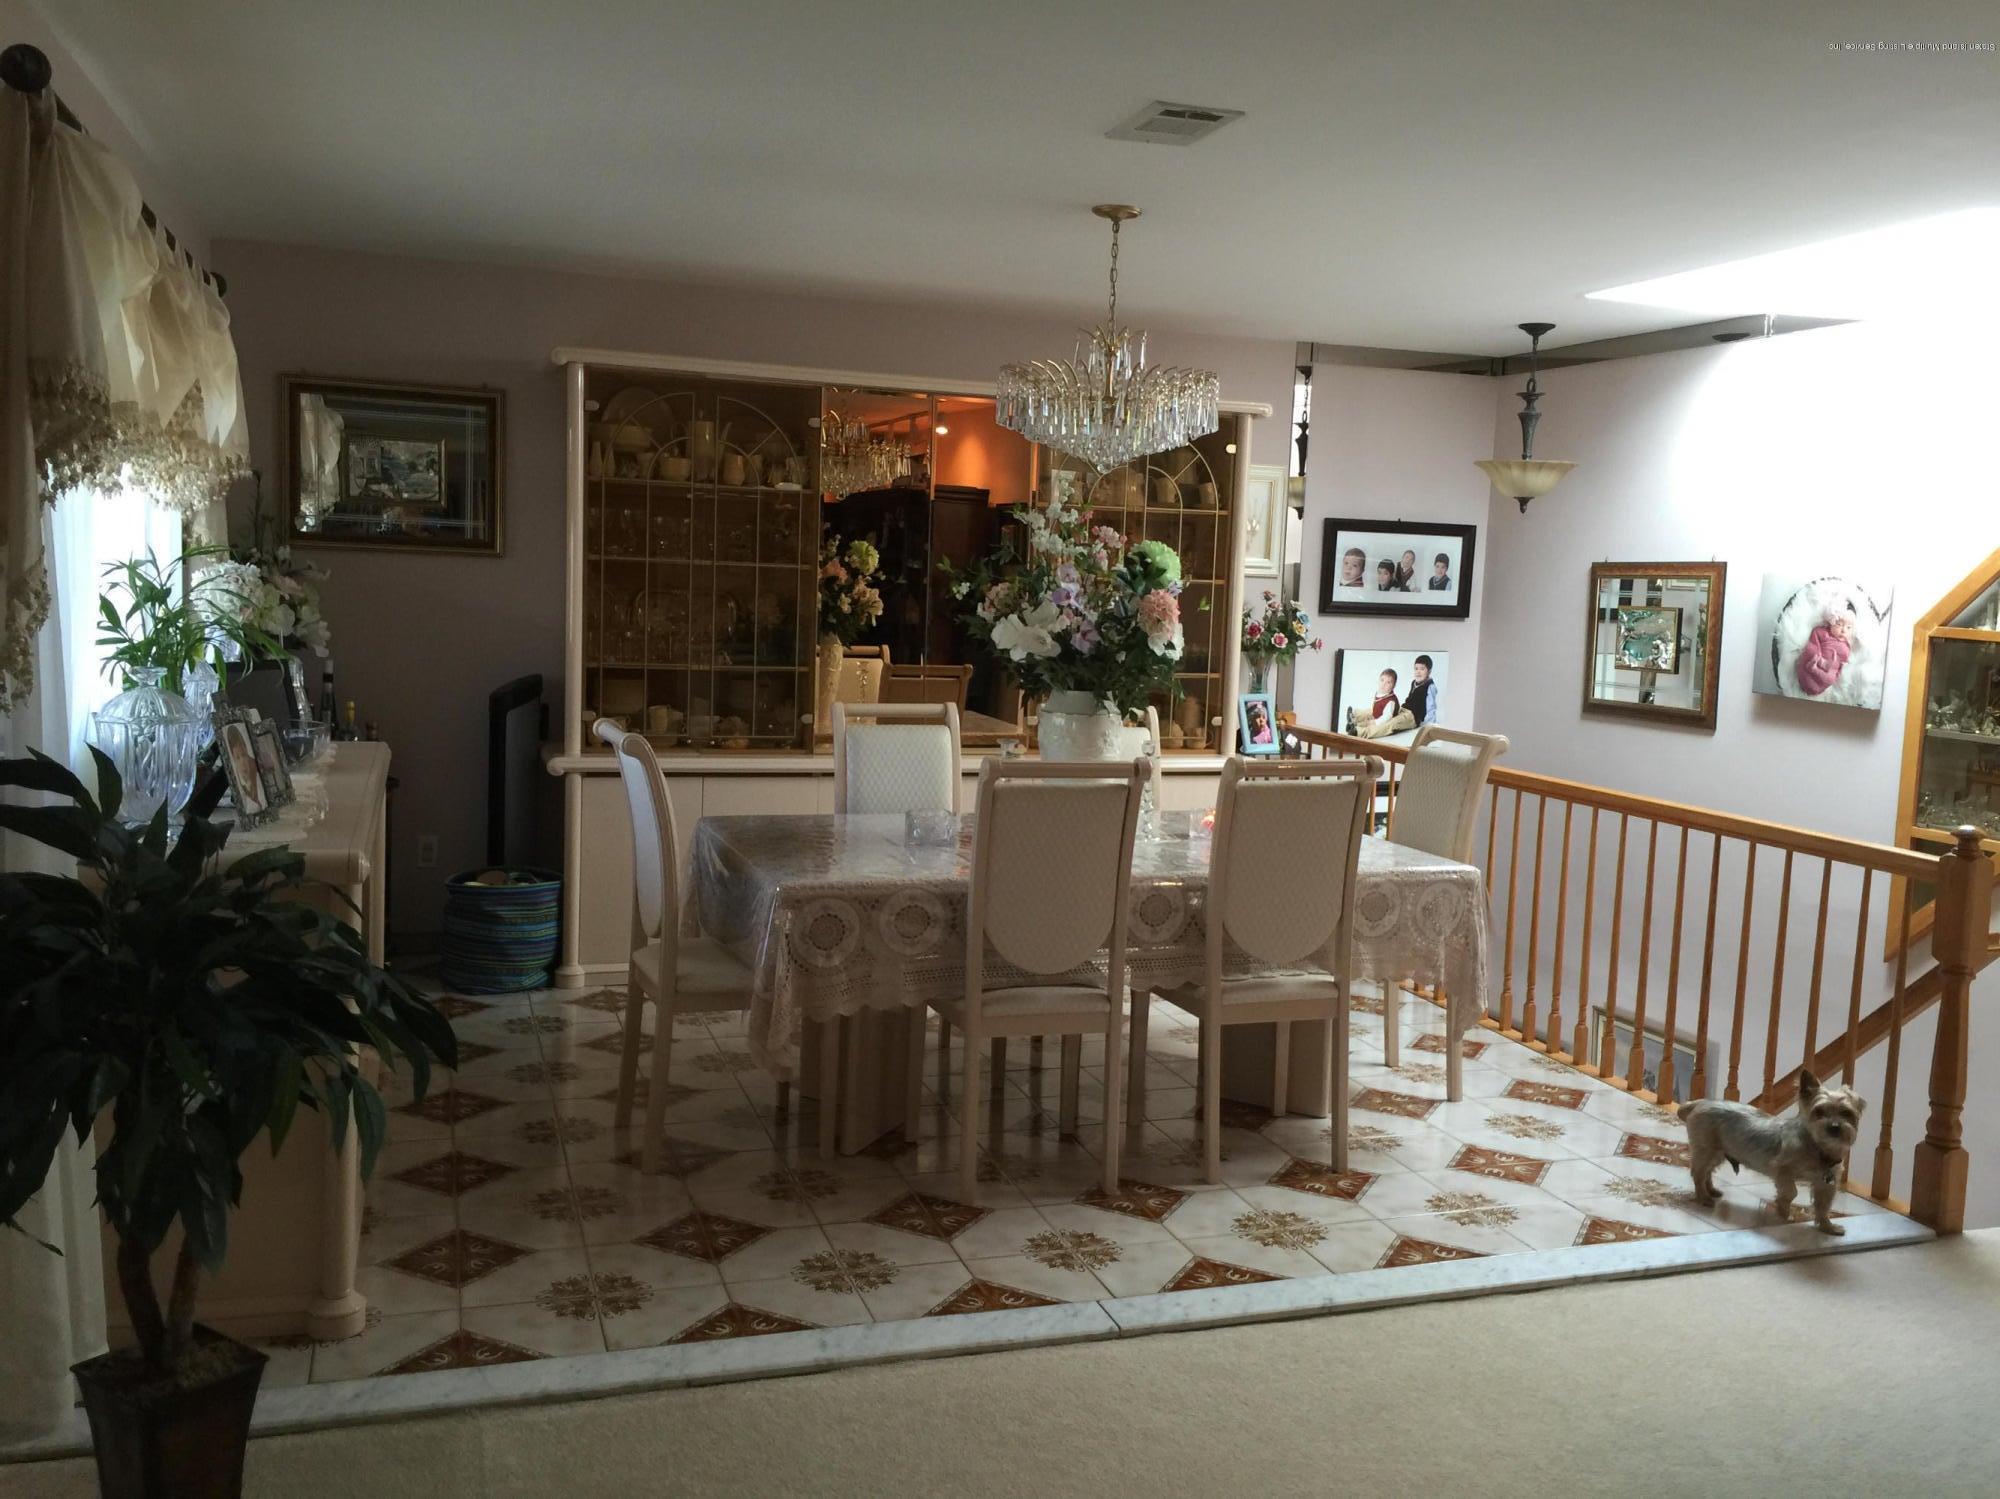 Single Family - Detached 108 Clarke Avenue  Staten Island, NY 10306, MLS-1106455-15